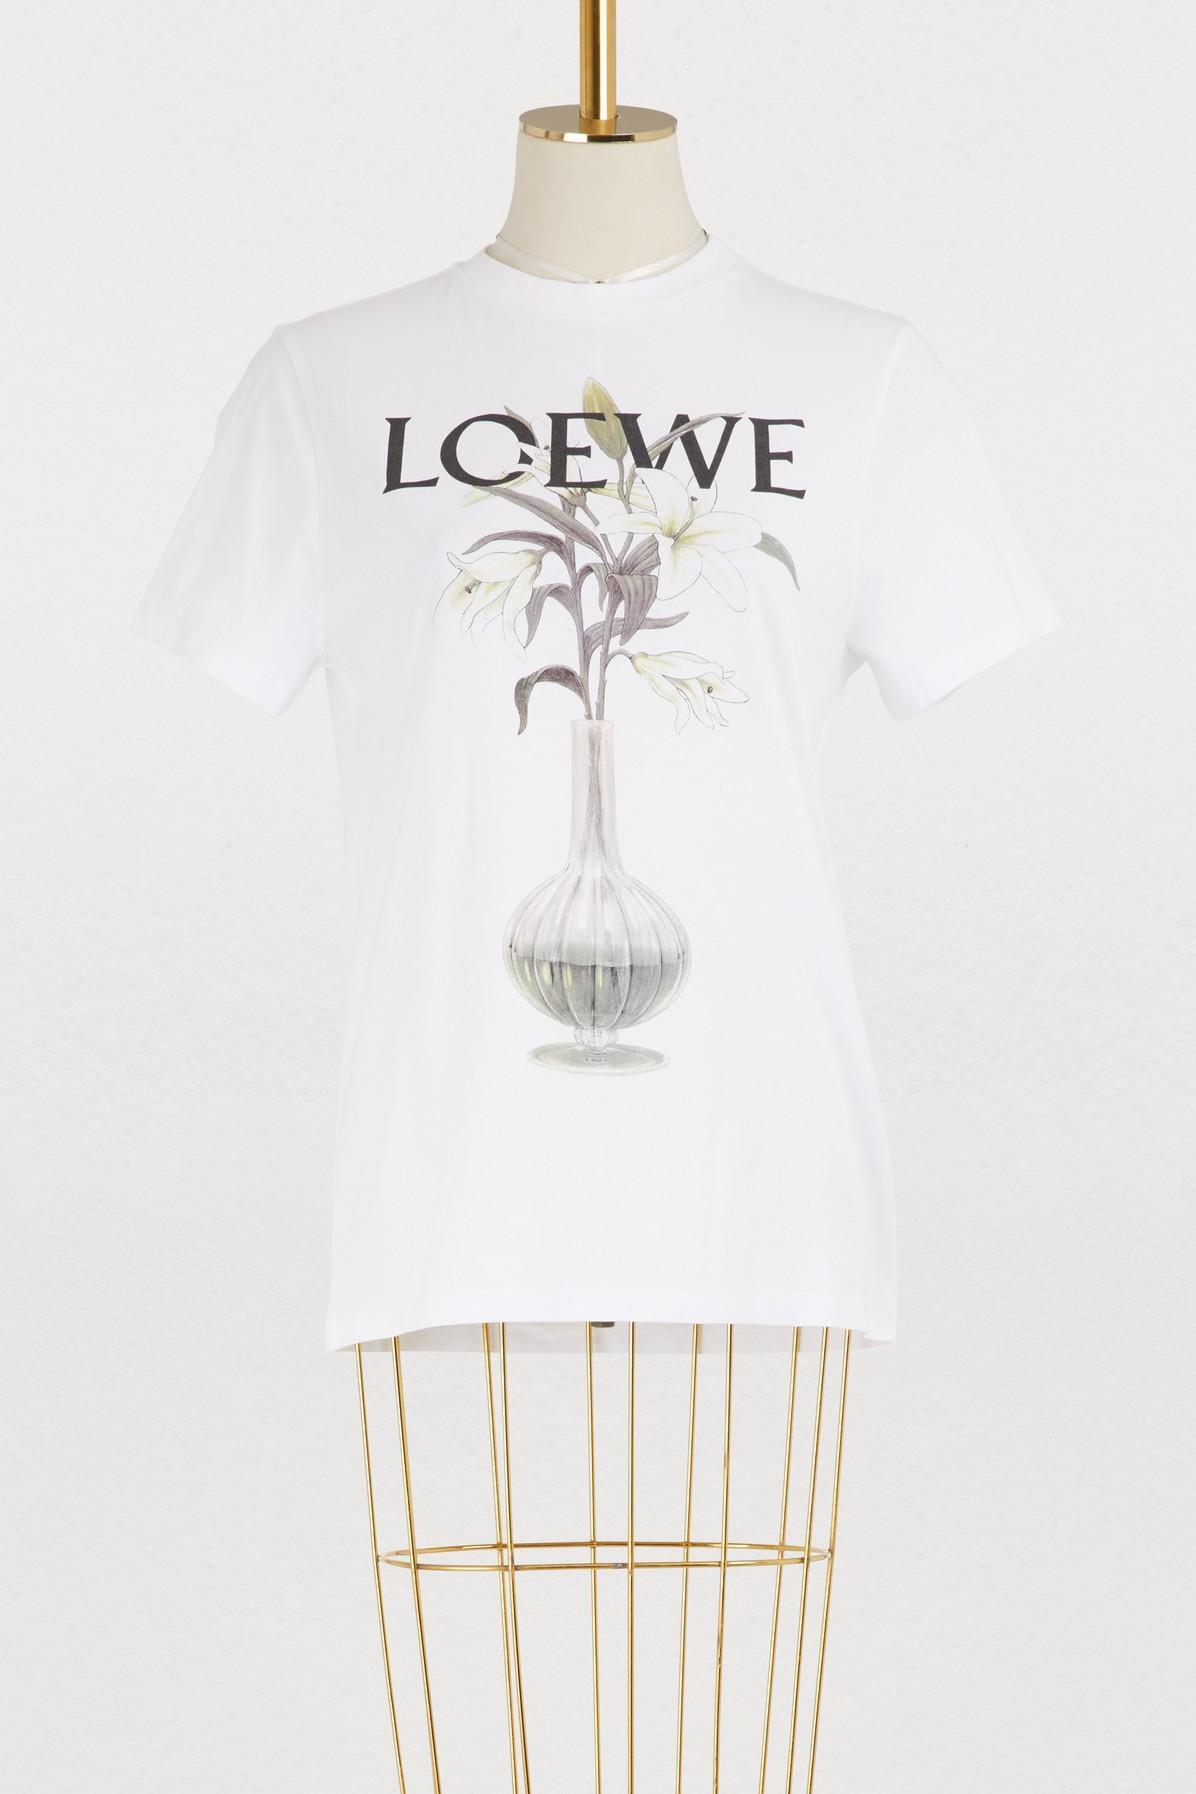 692af9804ae Loewe Logo Printed Cotton Jersey T-Shirt In White | ModeSens